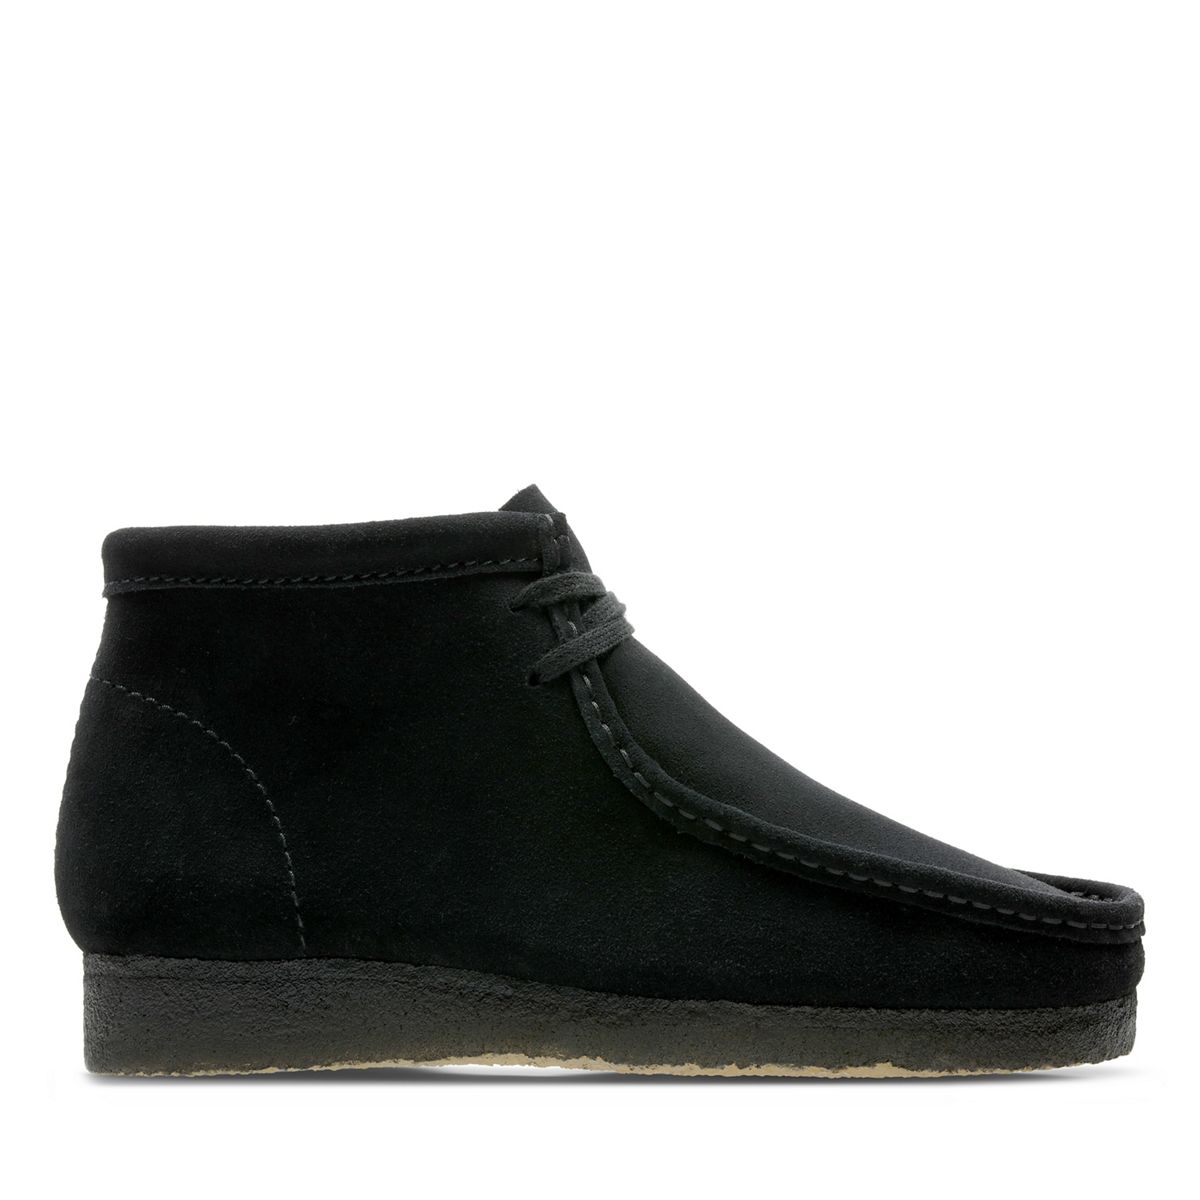 49516accddd Wallabee Boot - 7 / Standard Fit